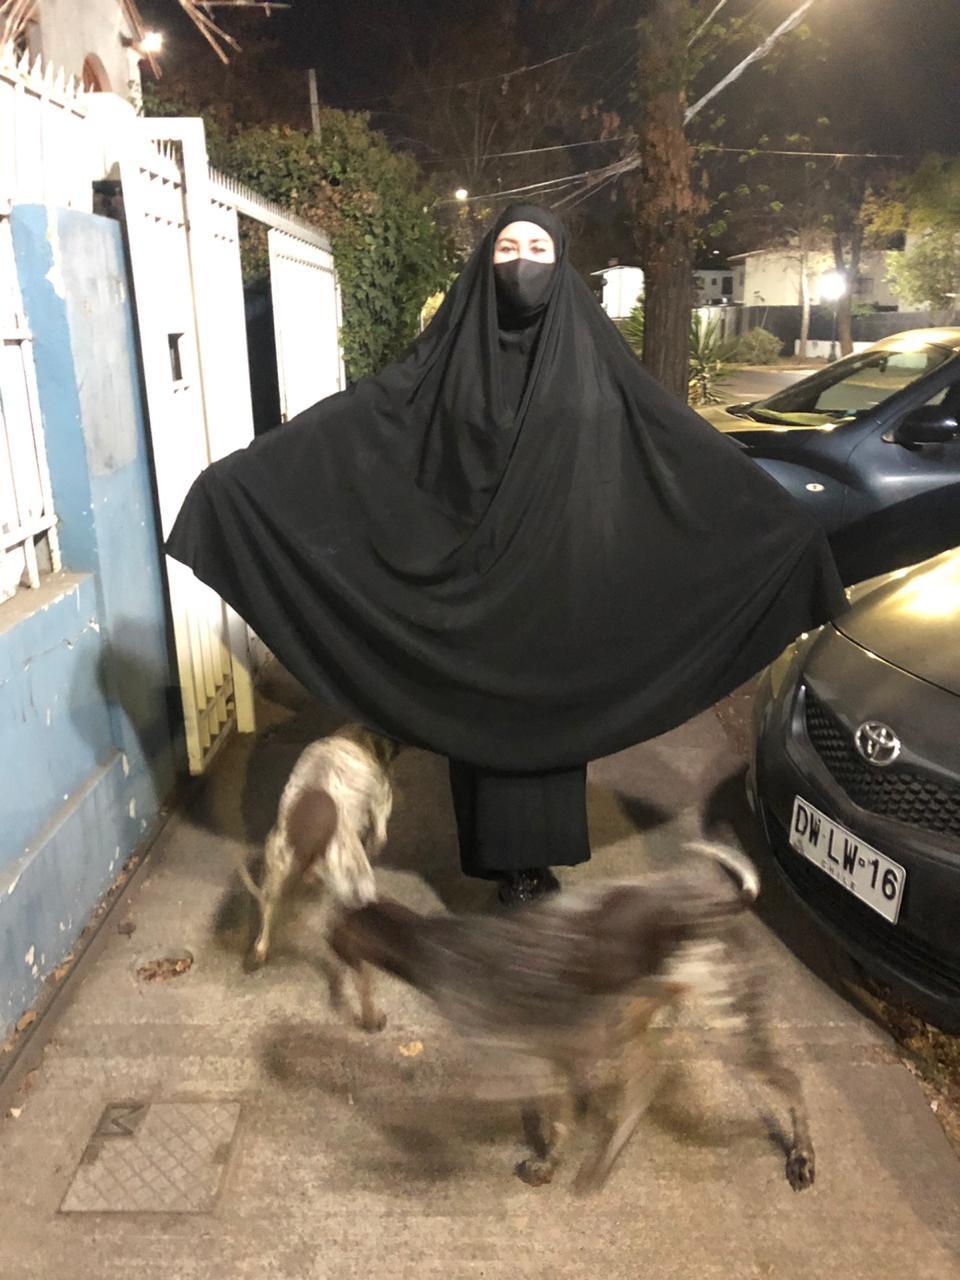 Experiencia burka_Silvia Veloso_Saposcat revista